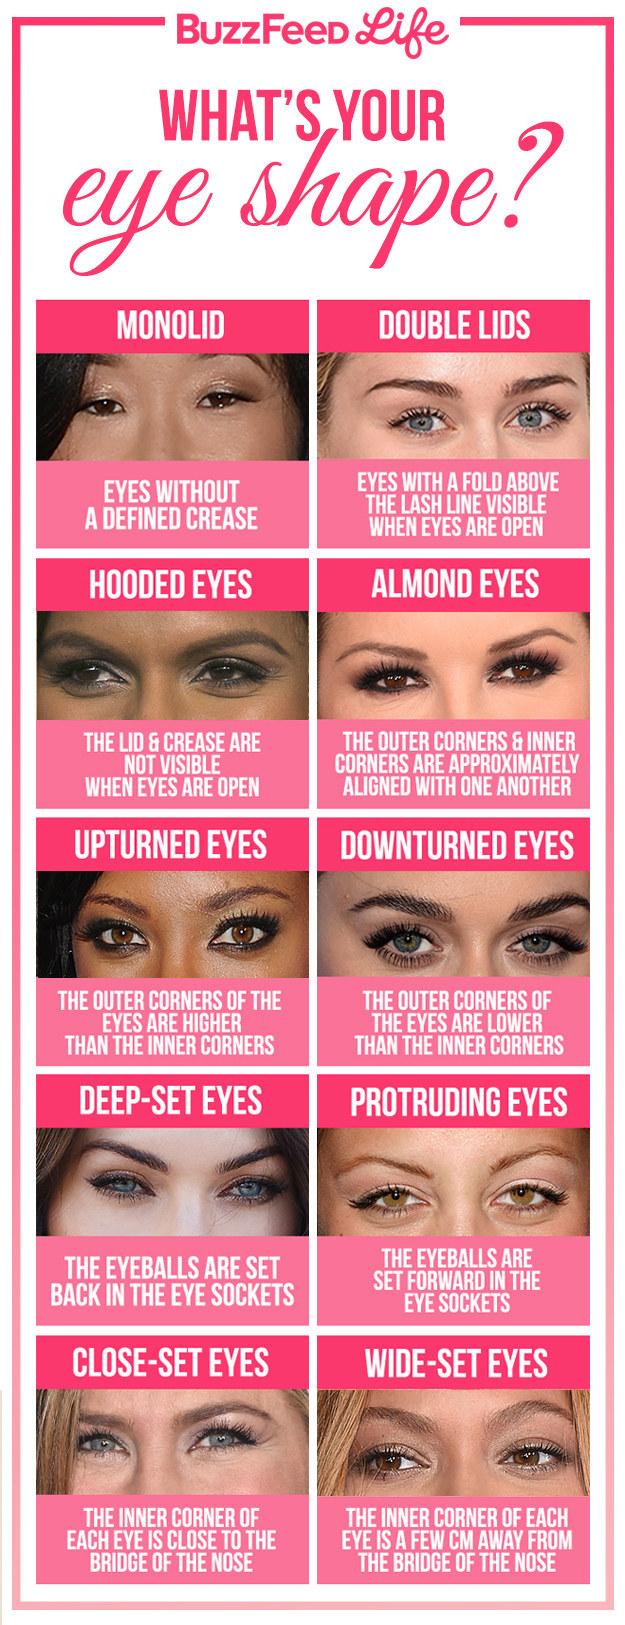 19 eyeshadow basics everyone should know Eye Shapes and Makeup